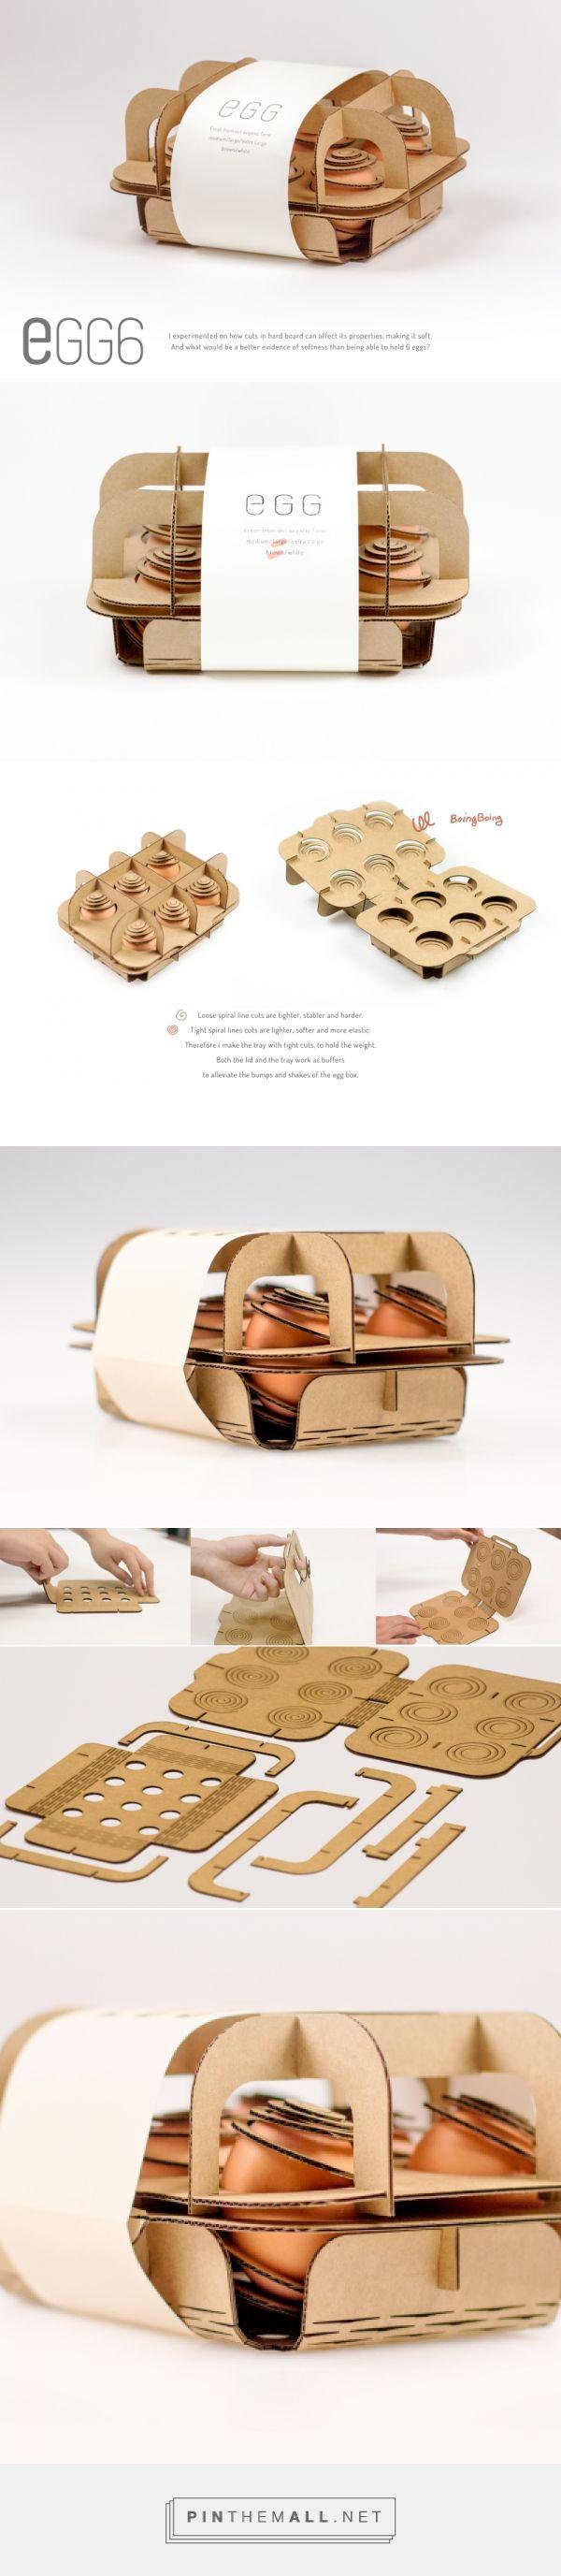 Mattress for Eggs - by Sichen Sun / Rhode Island School of Design / school project